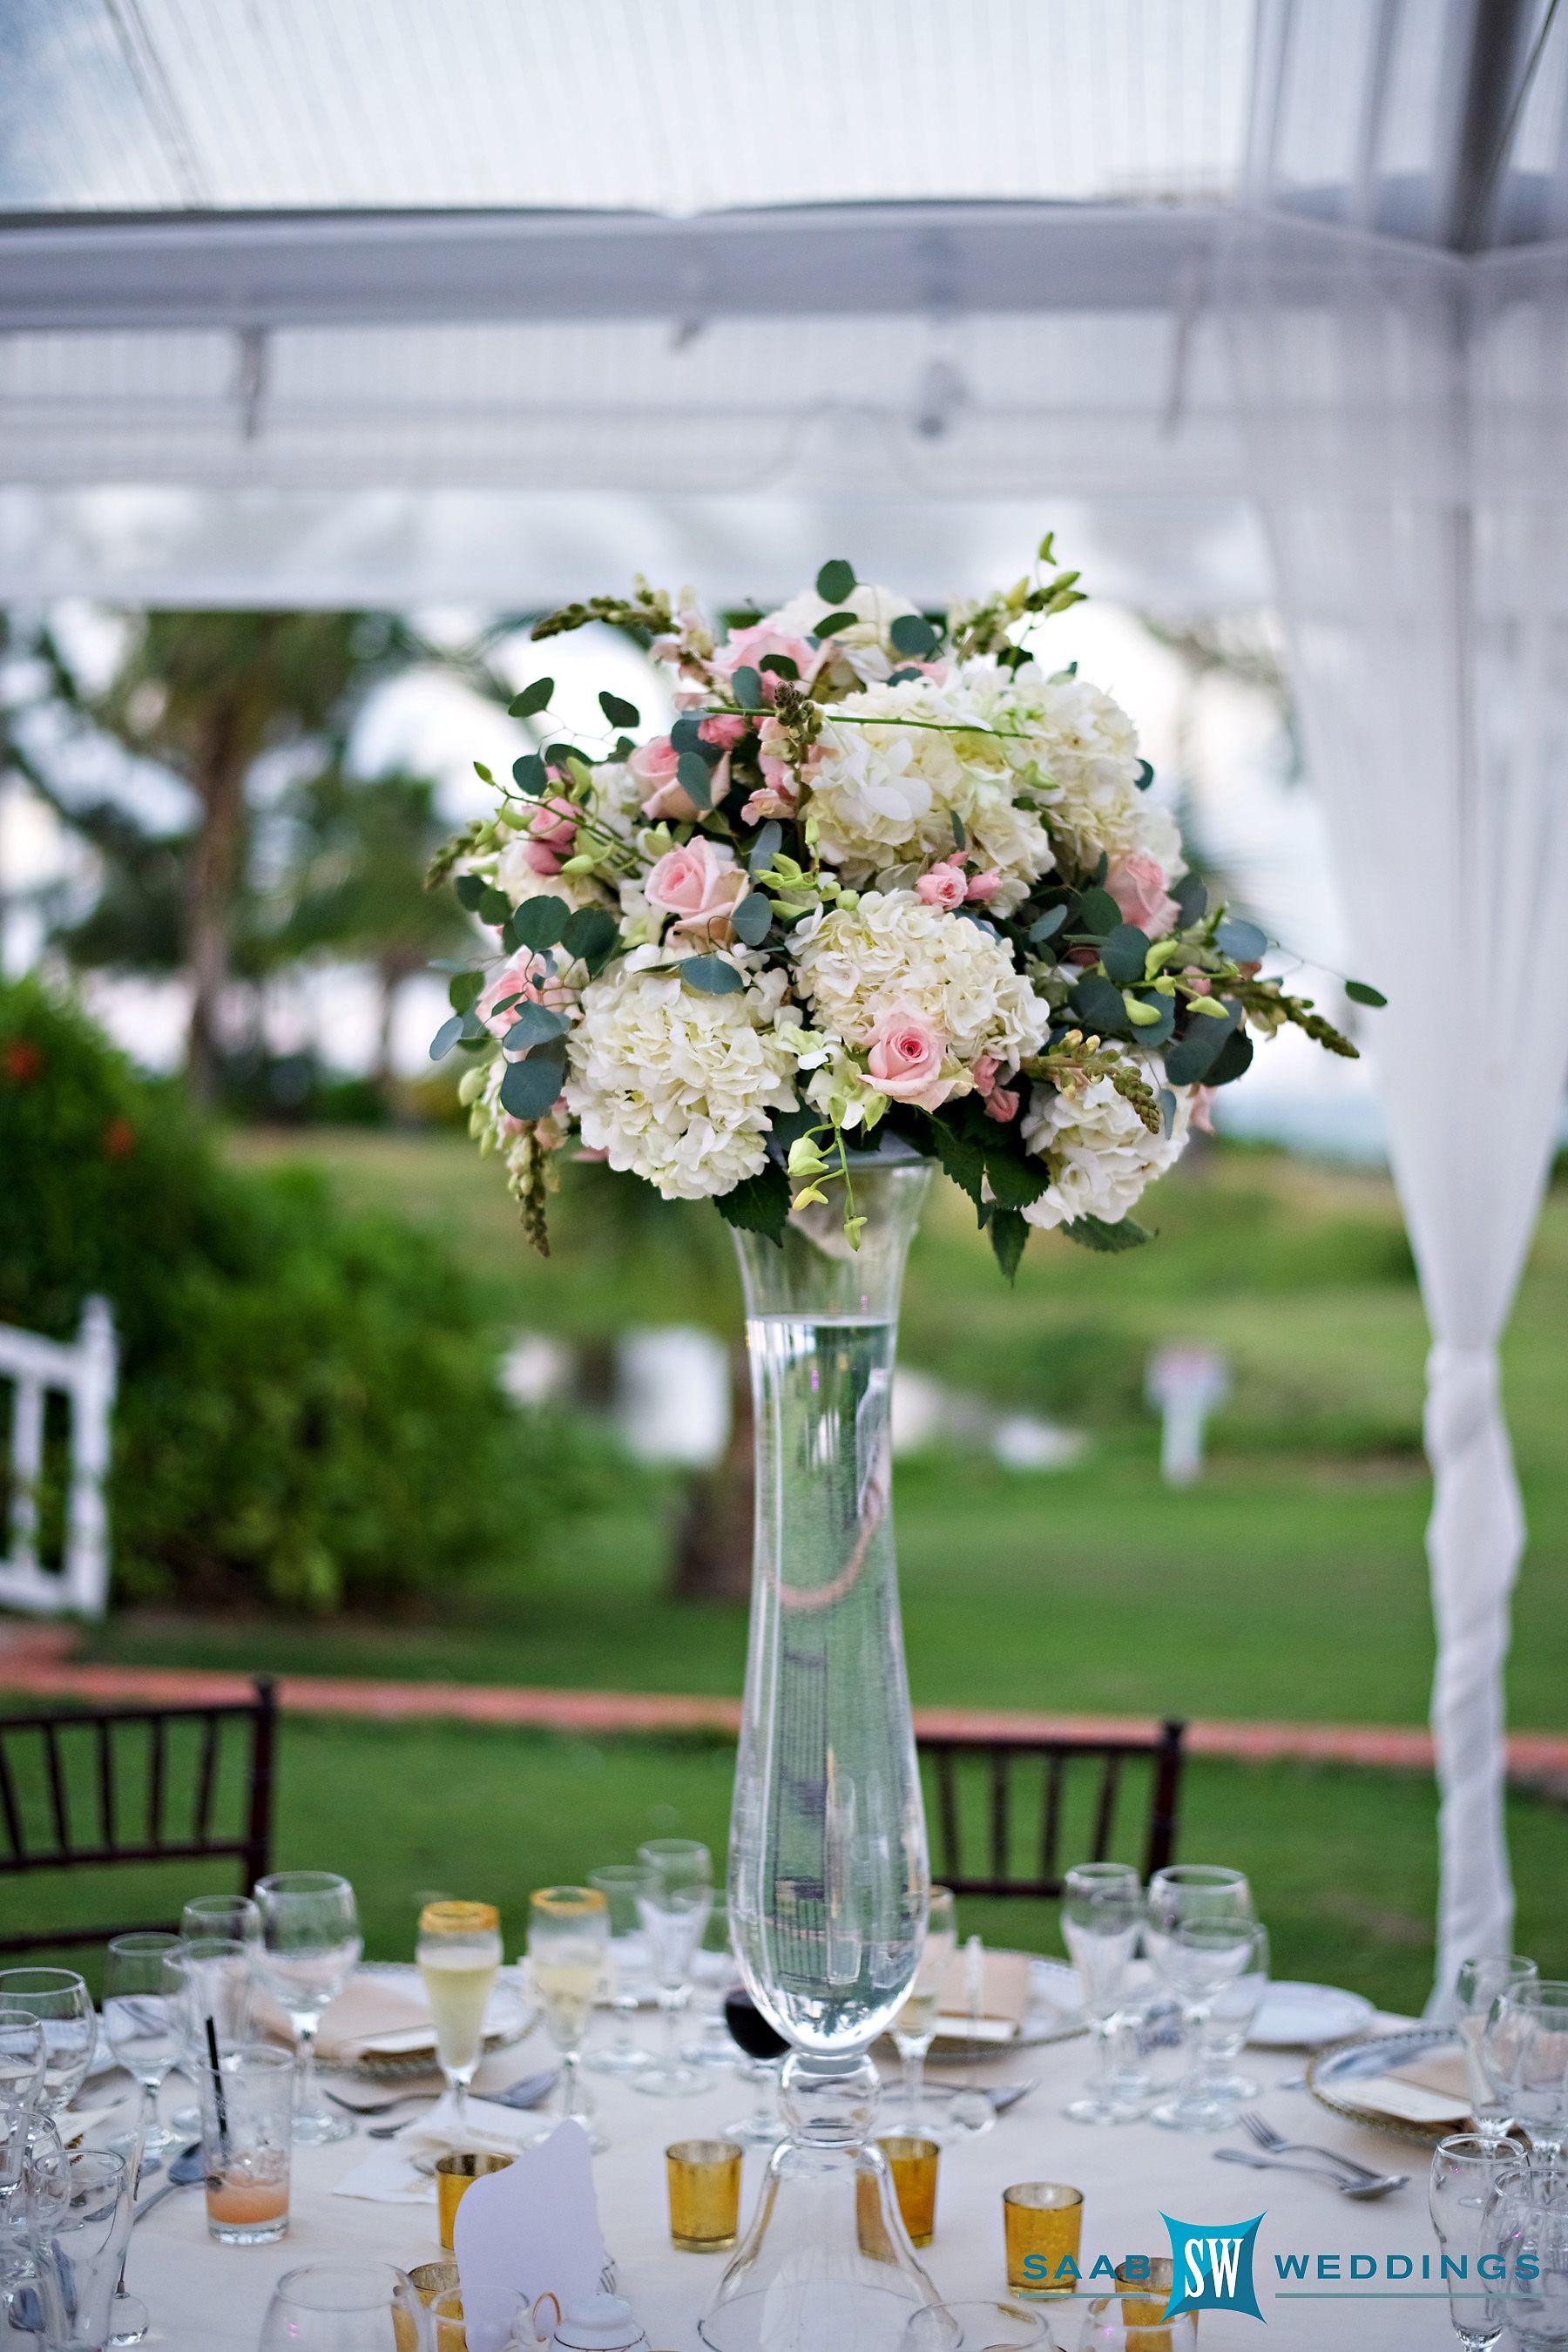 High Wedding Centerpiece With Hydrangea, Roses And Orchids #Halfmoonresort #Weddingflowers